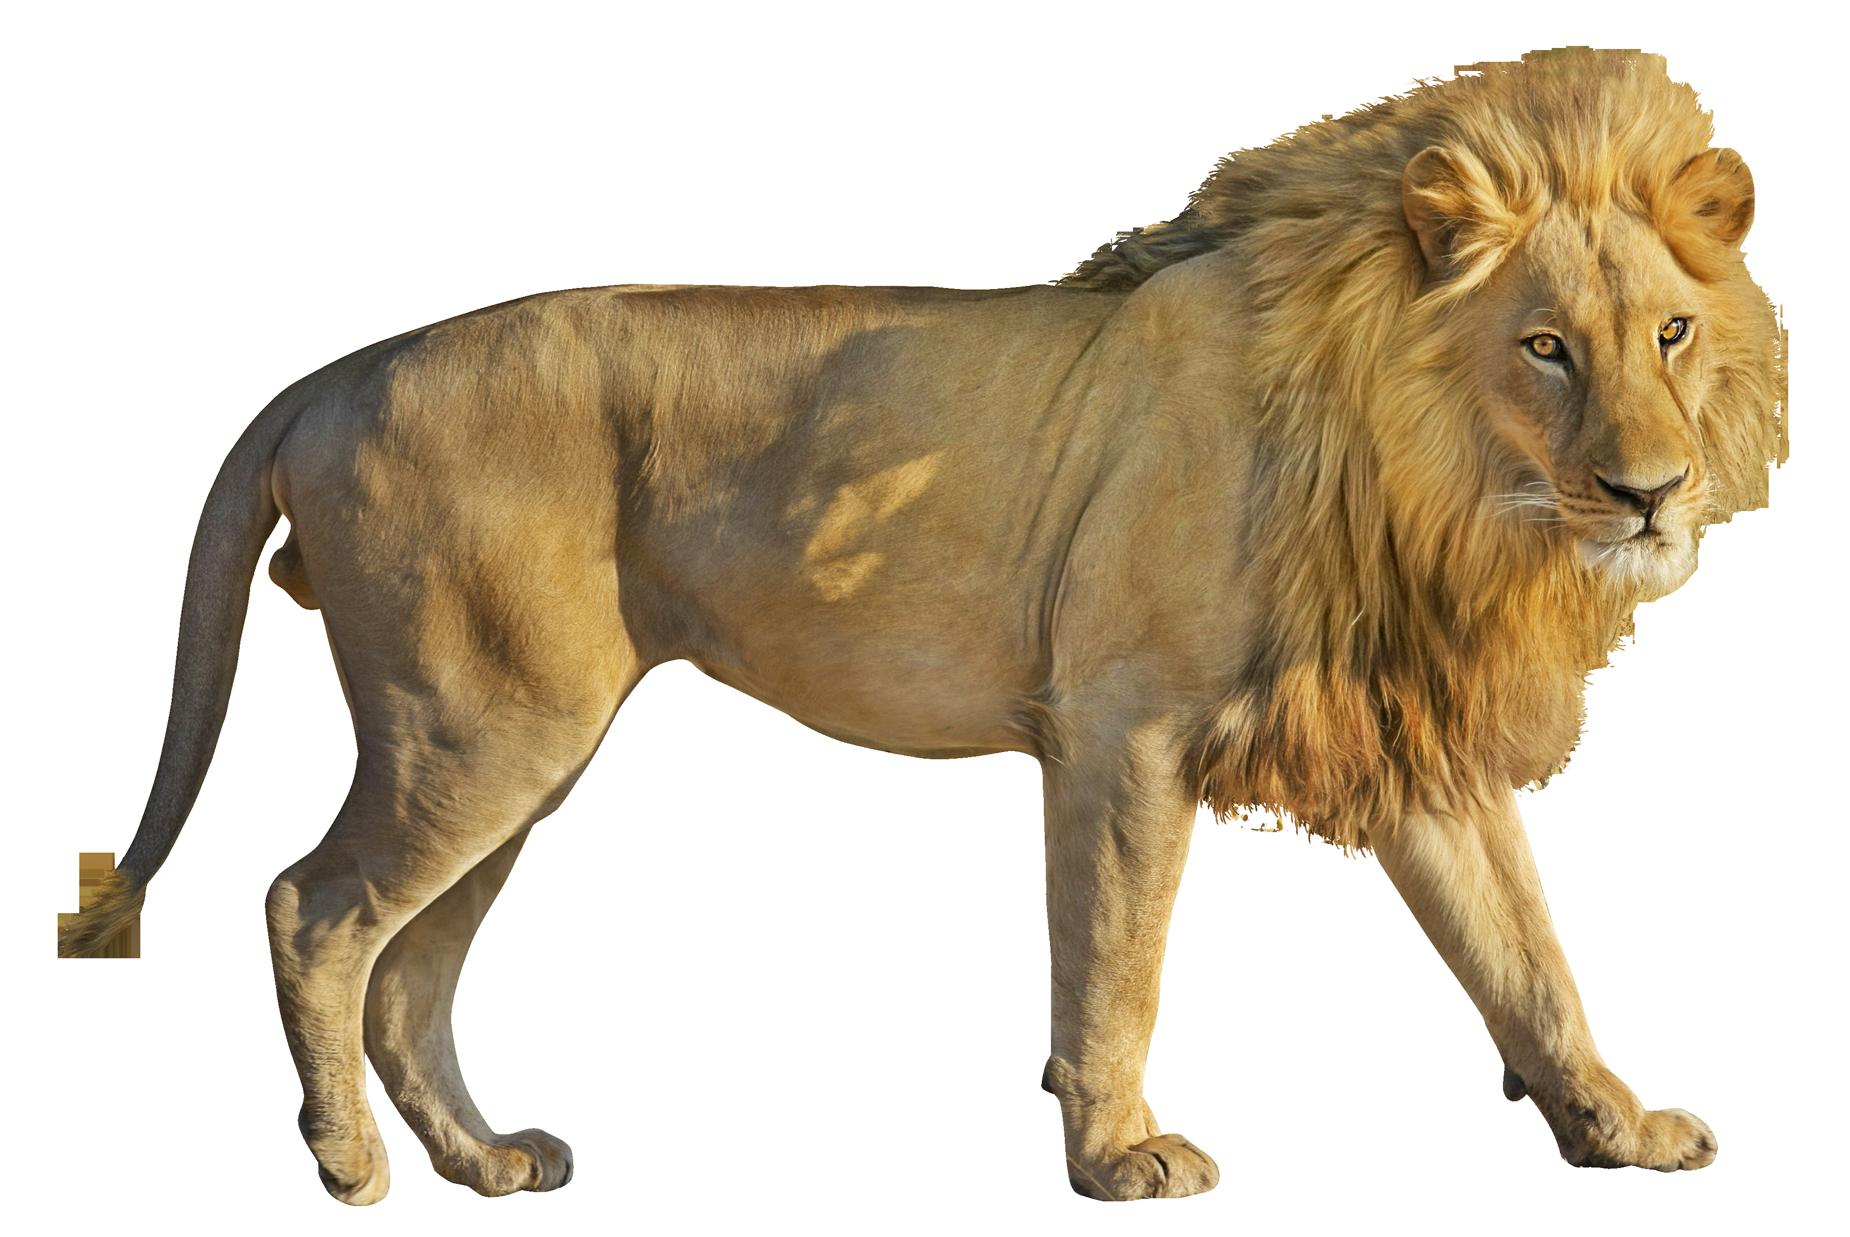 Clipart lion wild animal. Png image purepng free